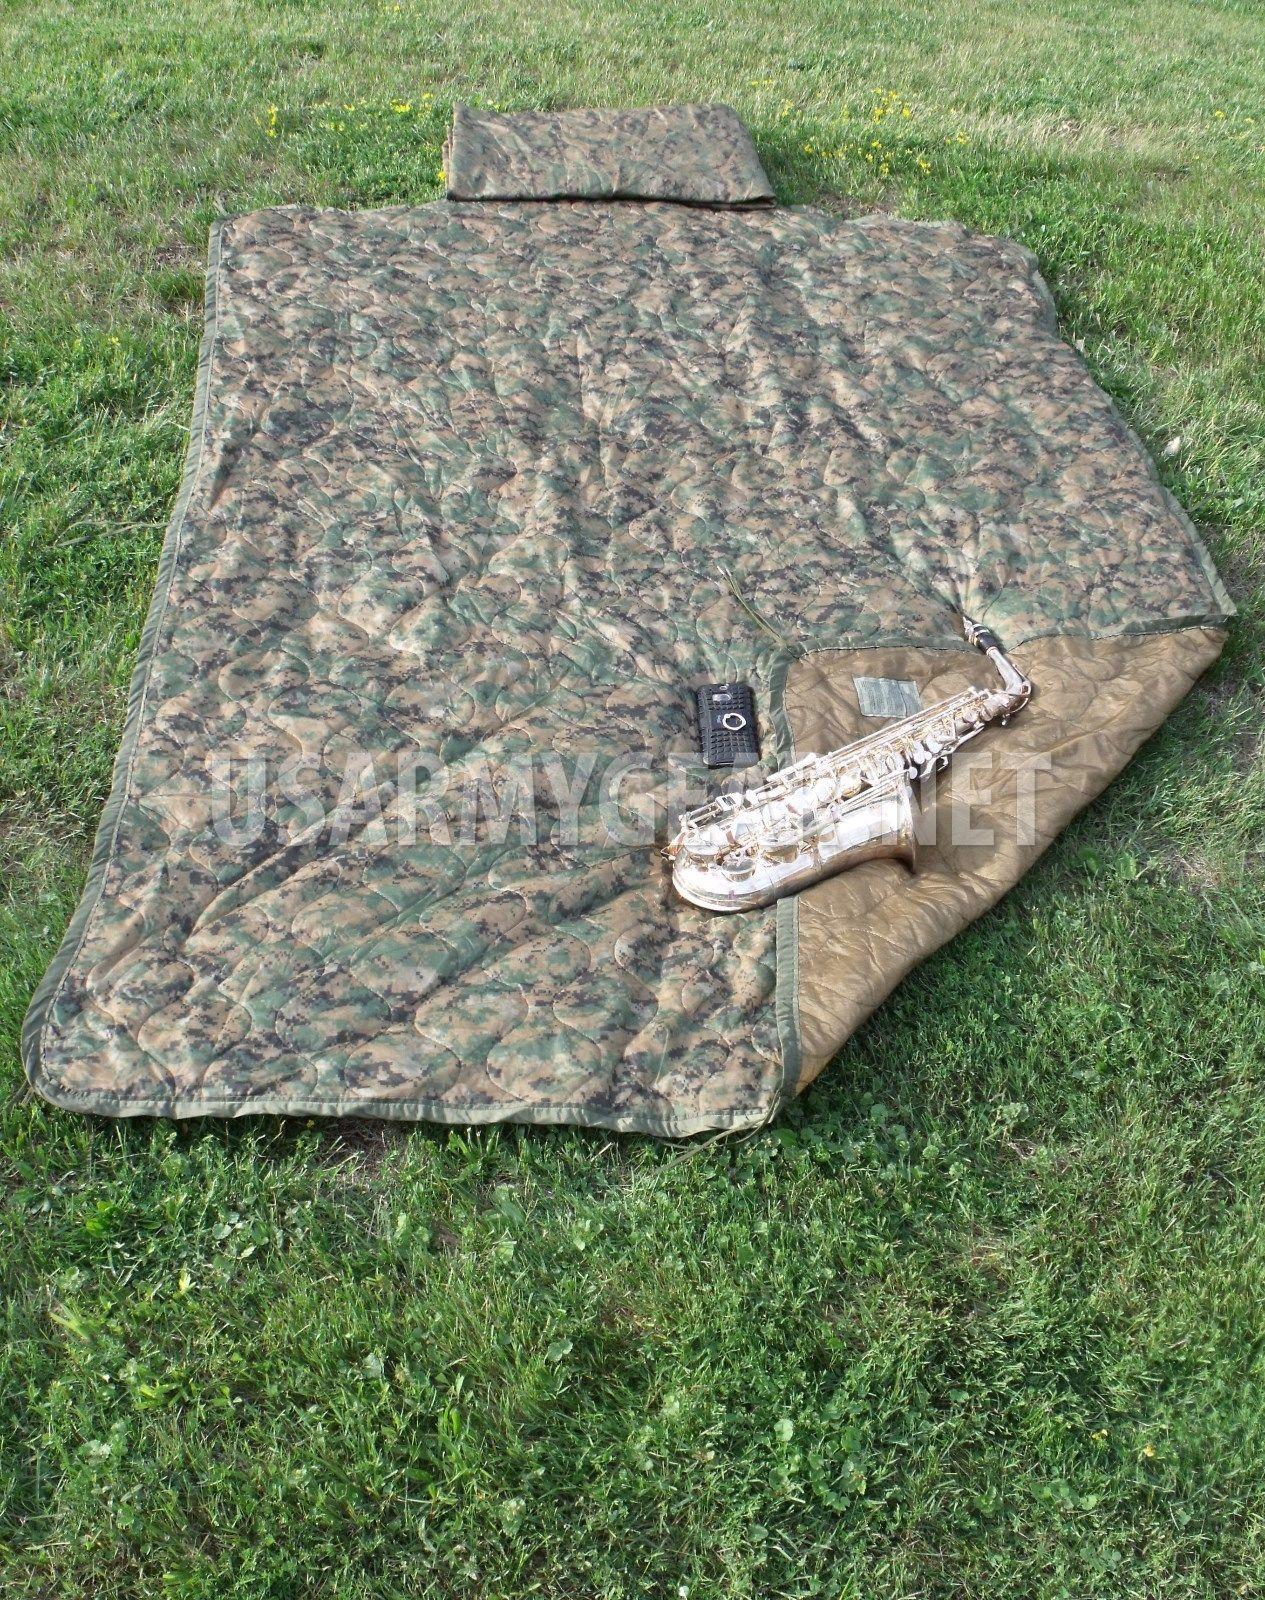 Army Usmc Marine Corps Issue Digital Woodland Blanket Poncho Liner Us Gear